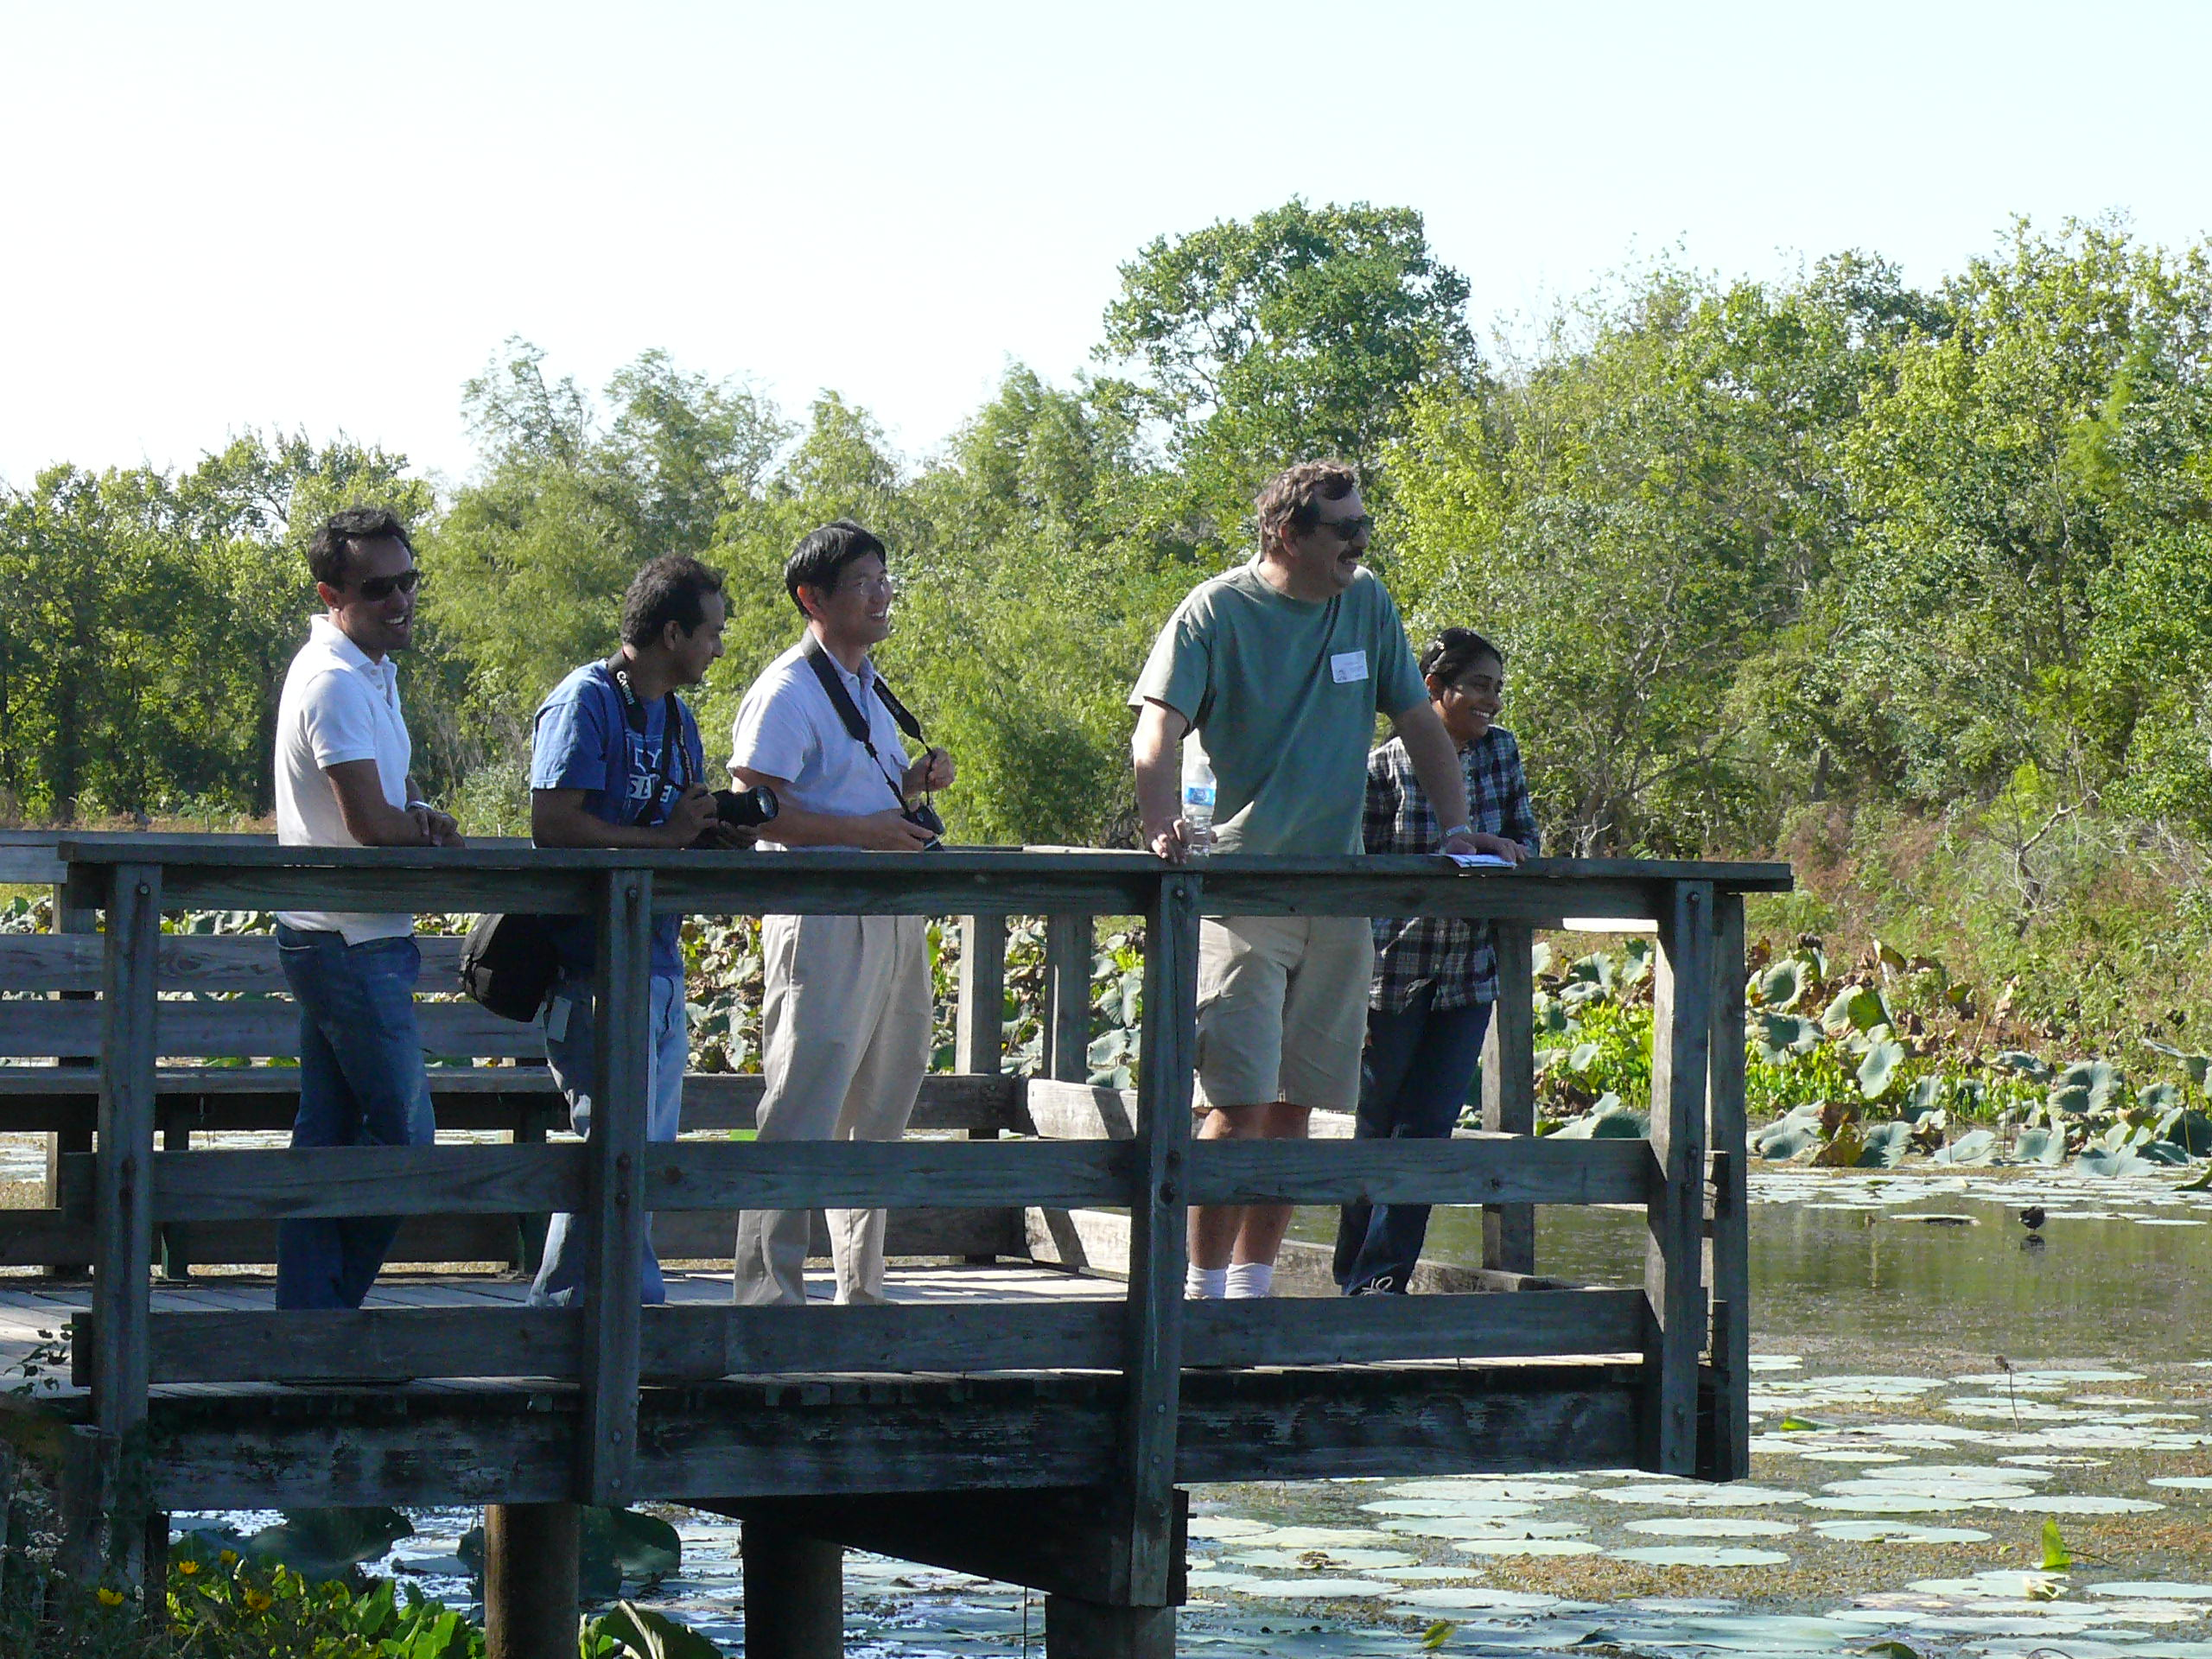 : Redwan Huq, Rajeev Tajhya, Dr. Xueyou Hu, Dr, György Panyi, and Dr. Shyny Koshy at Brazos Bend State Park, in 2011